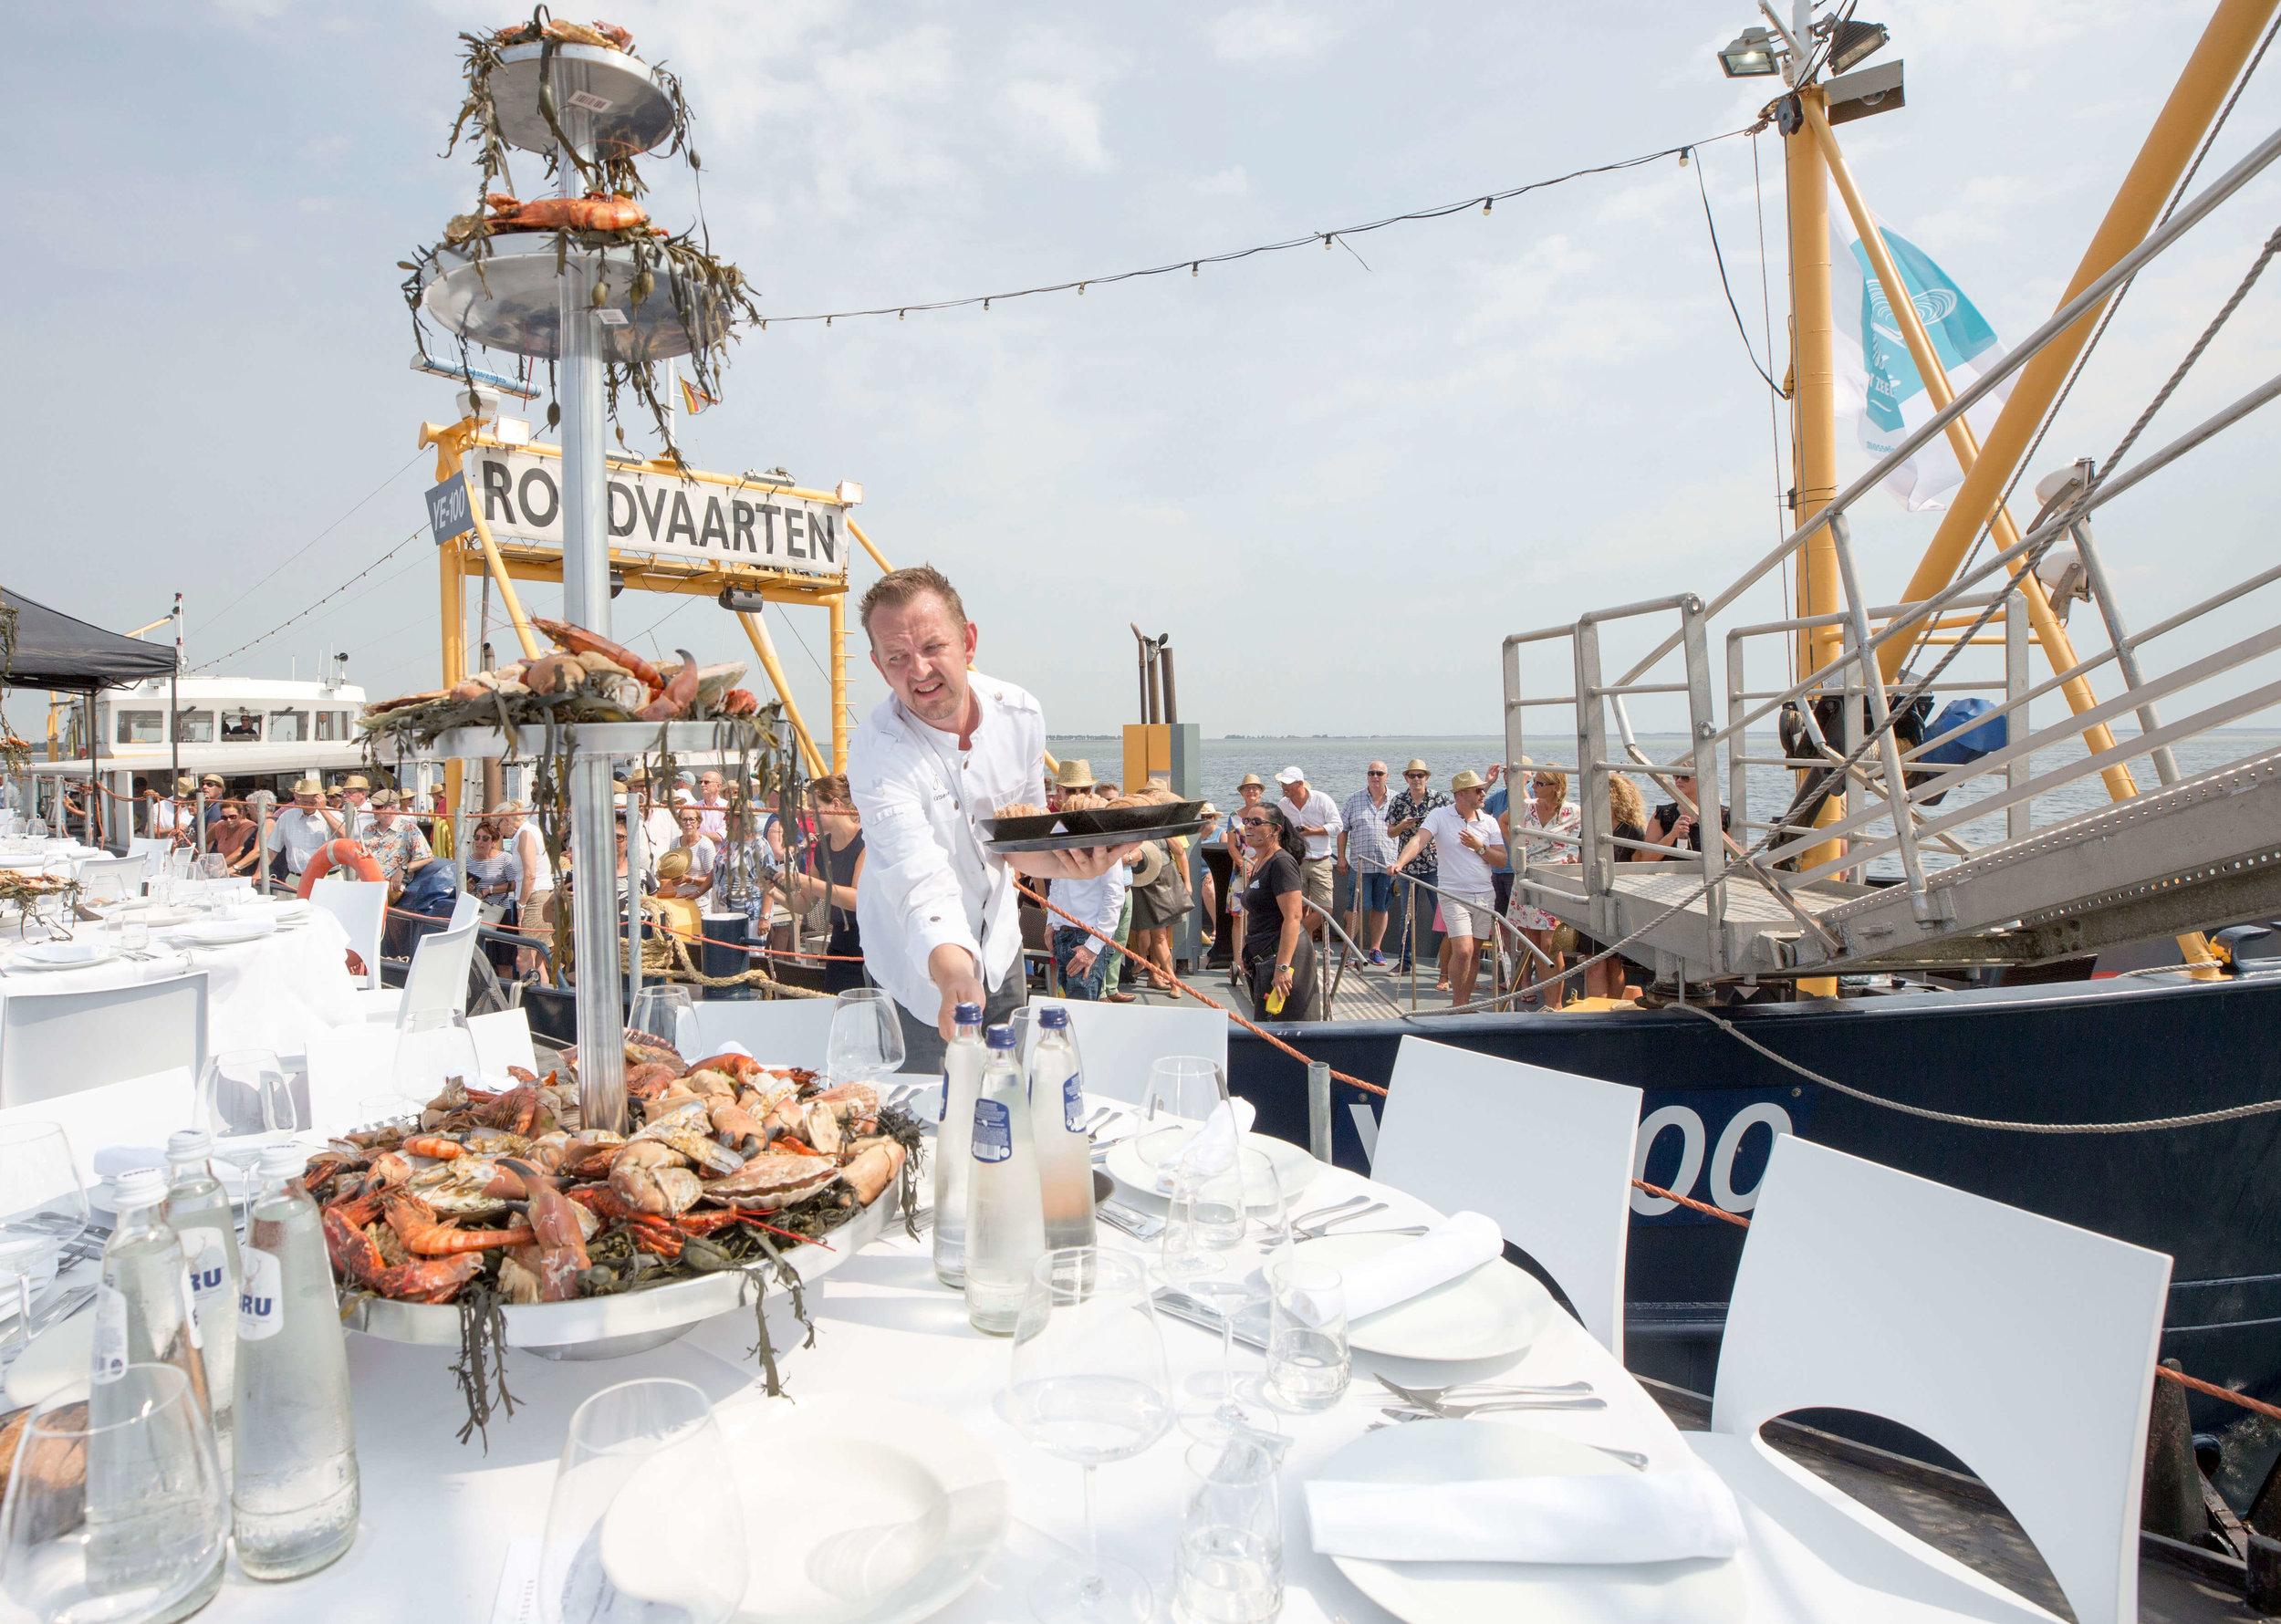 JvdH Katse Veer eten op ponton -69.jpg